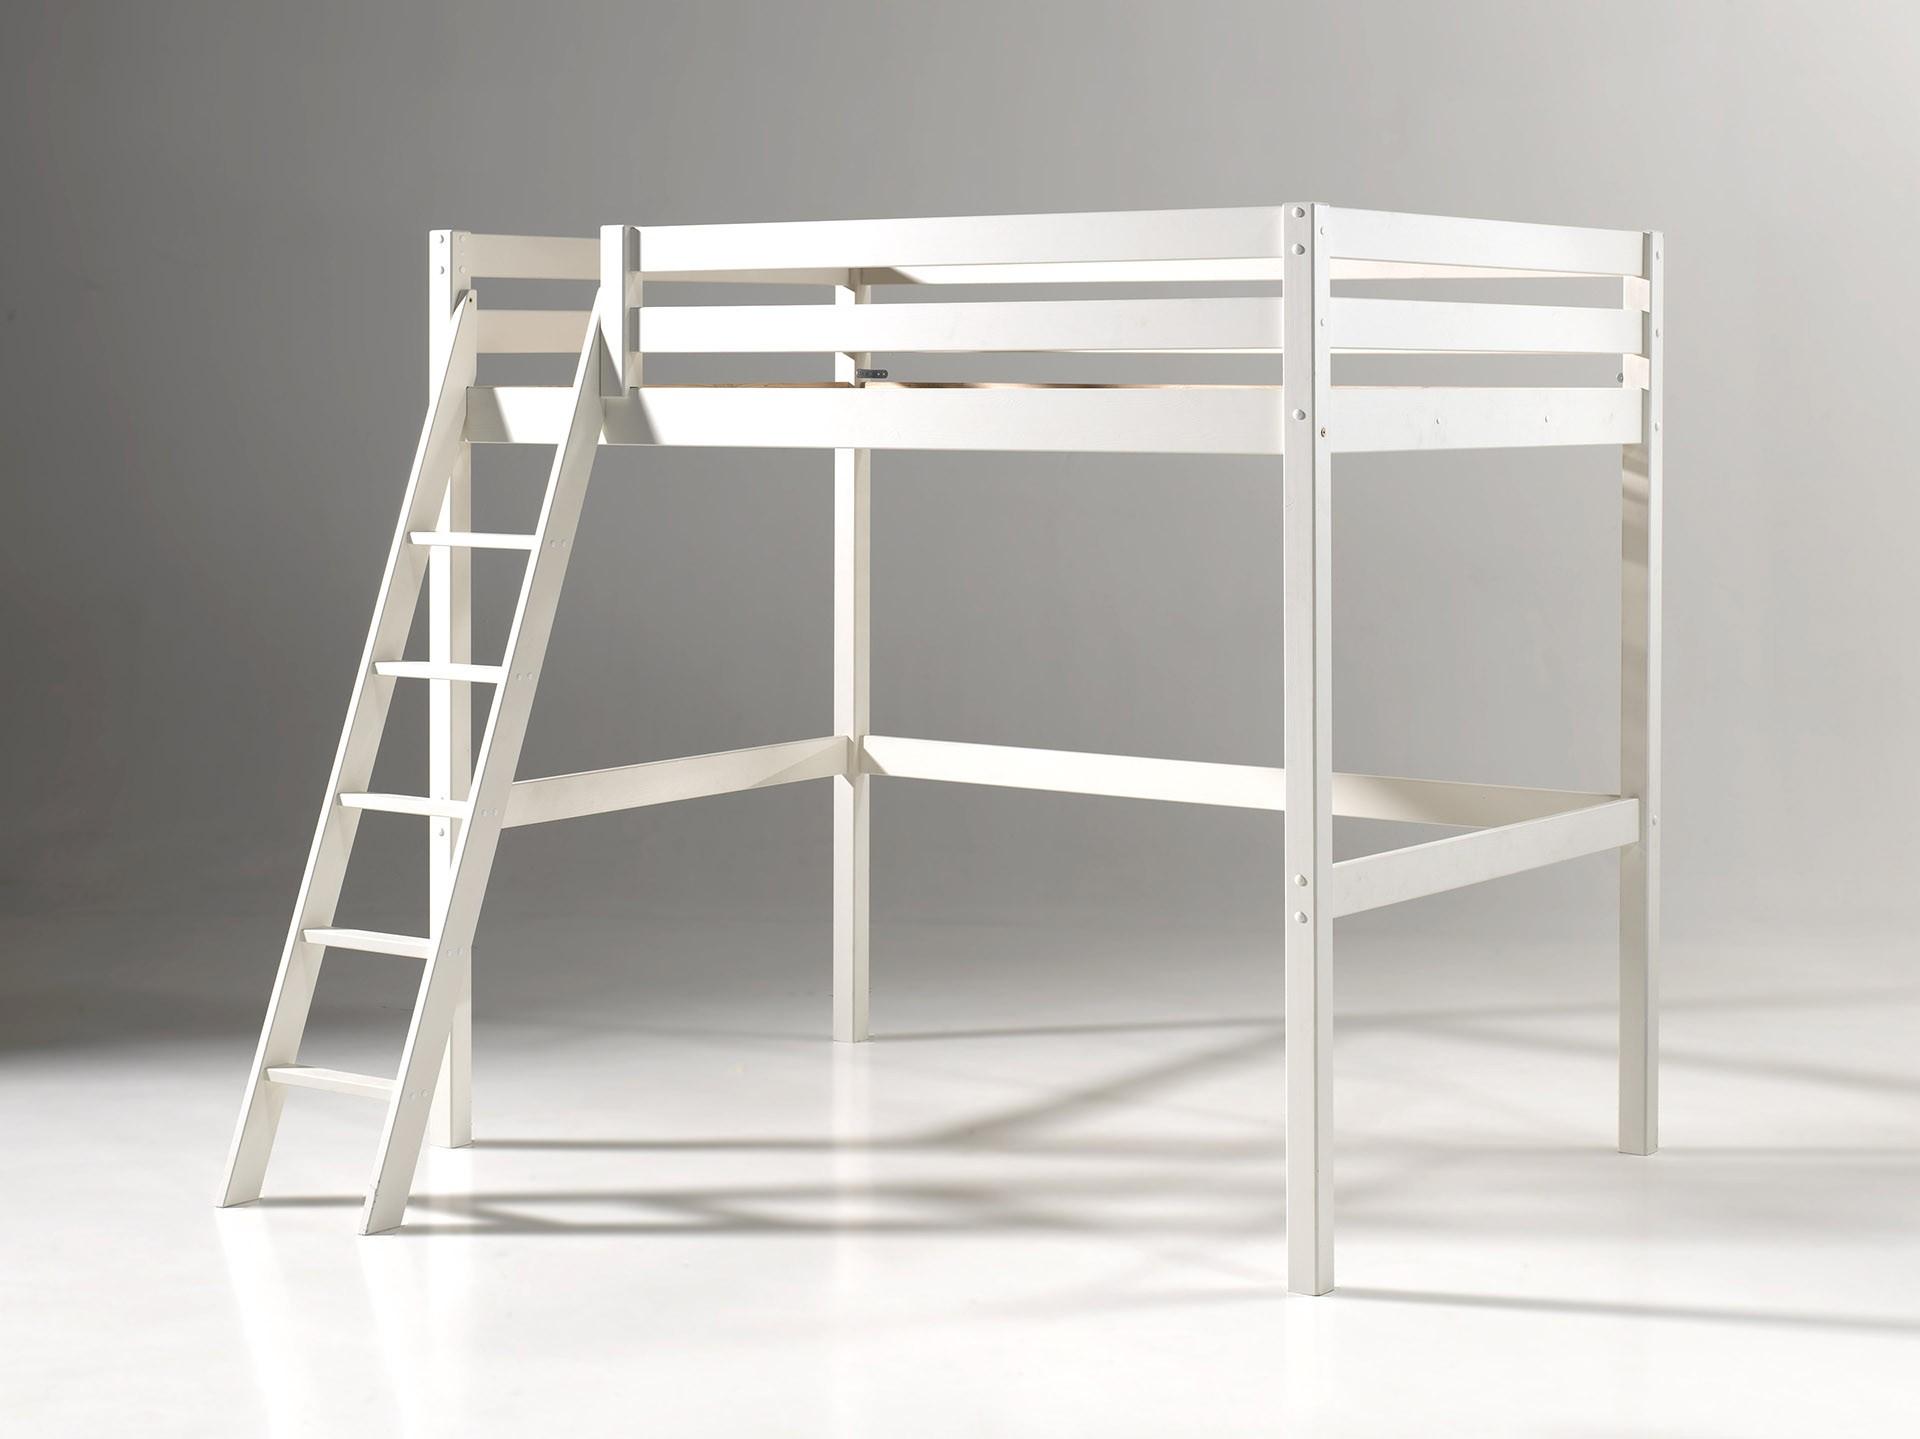 lit mezzanine 140x200 cm clara en pin massif avec sommier so nuit. Black Bedroom Furniture Sets. Home Design Ideas